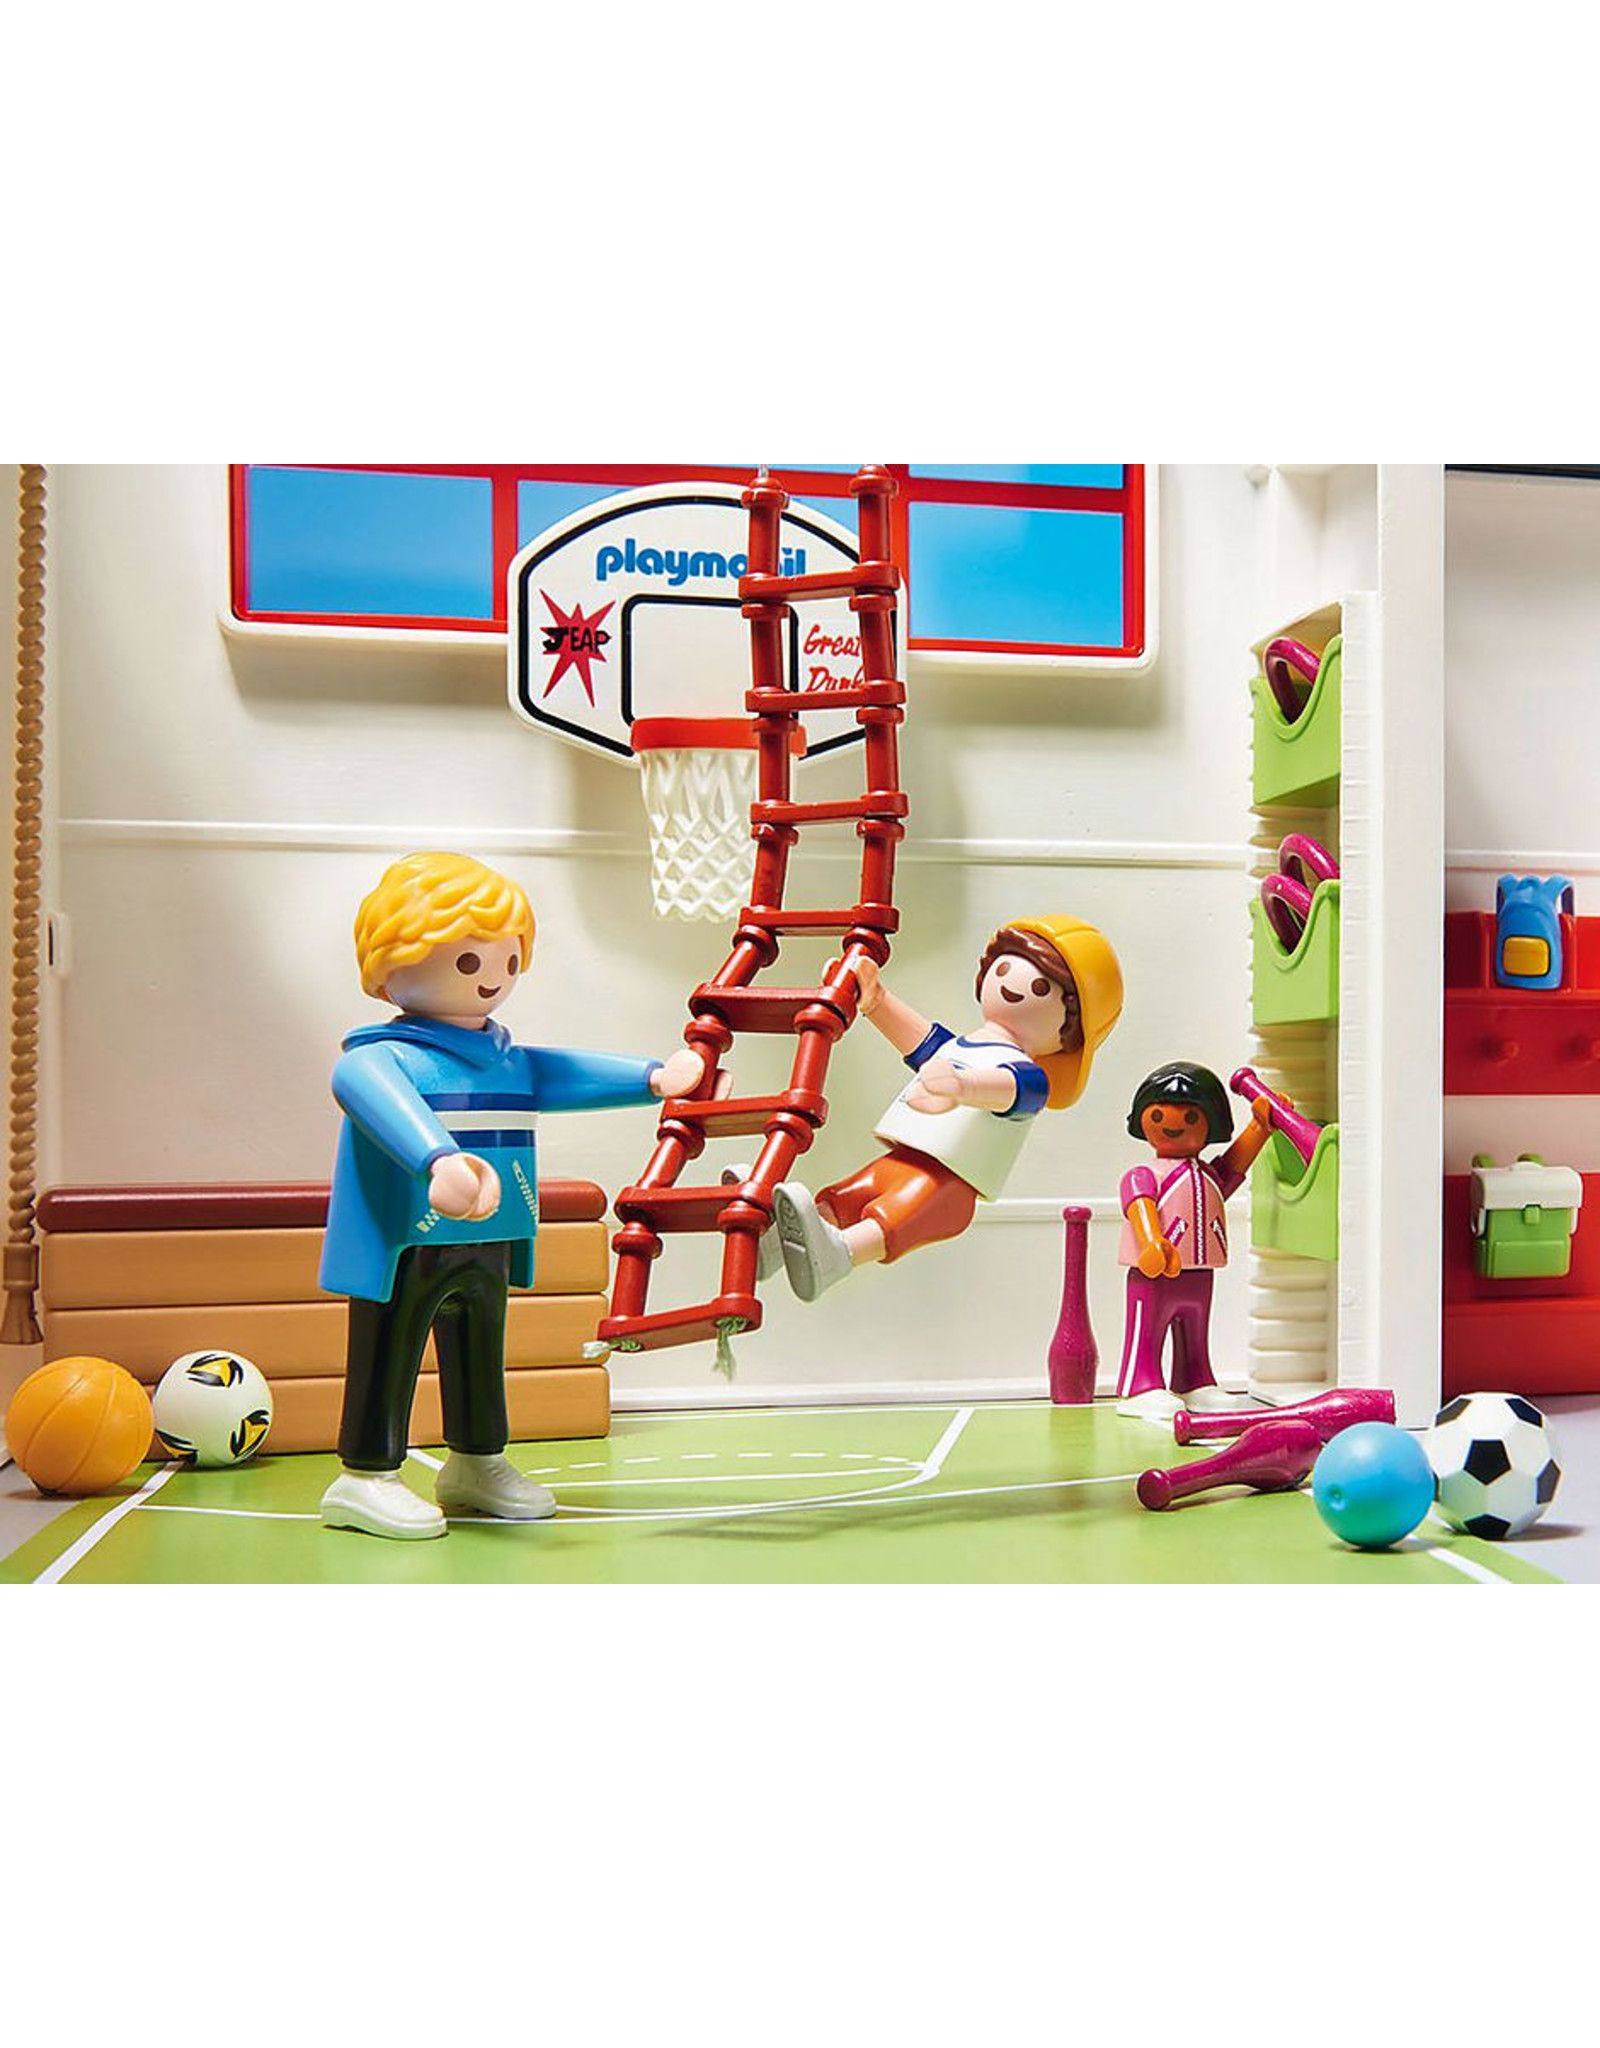 Playmobil Gym